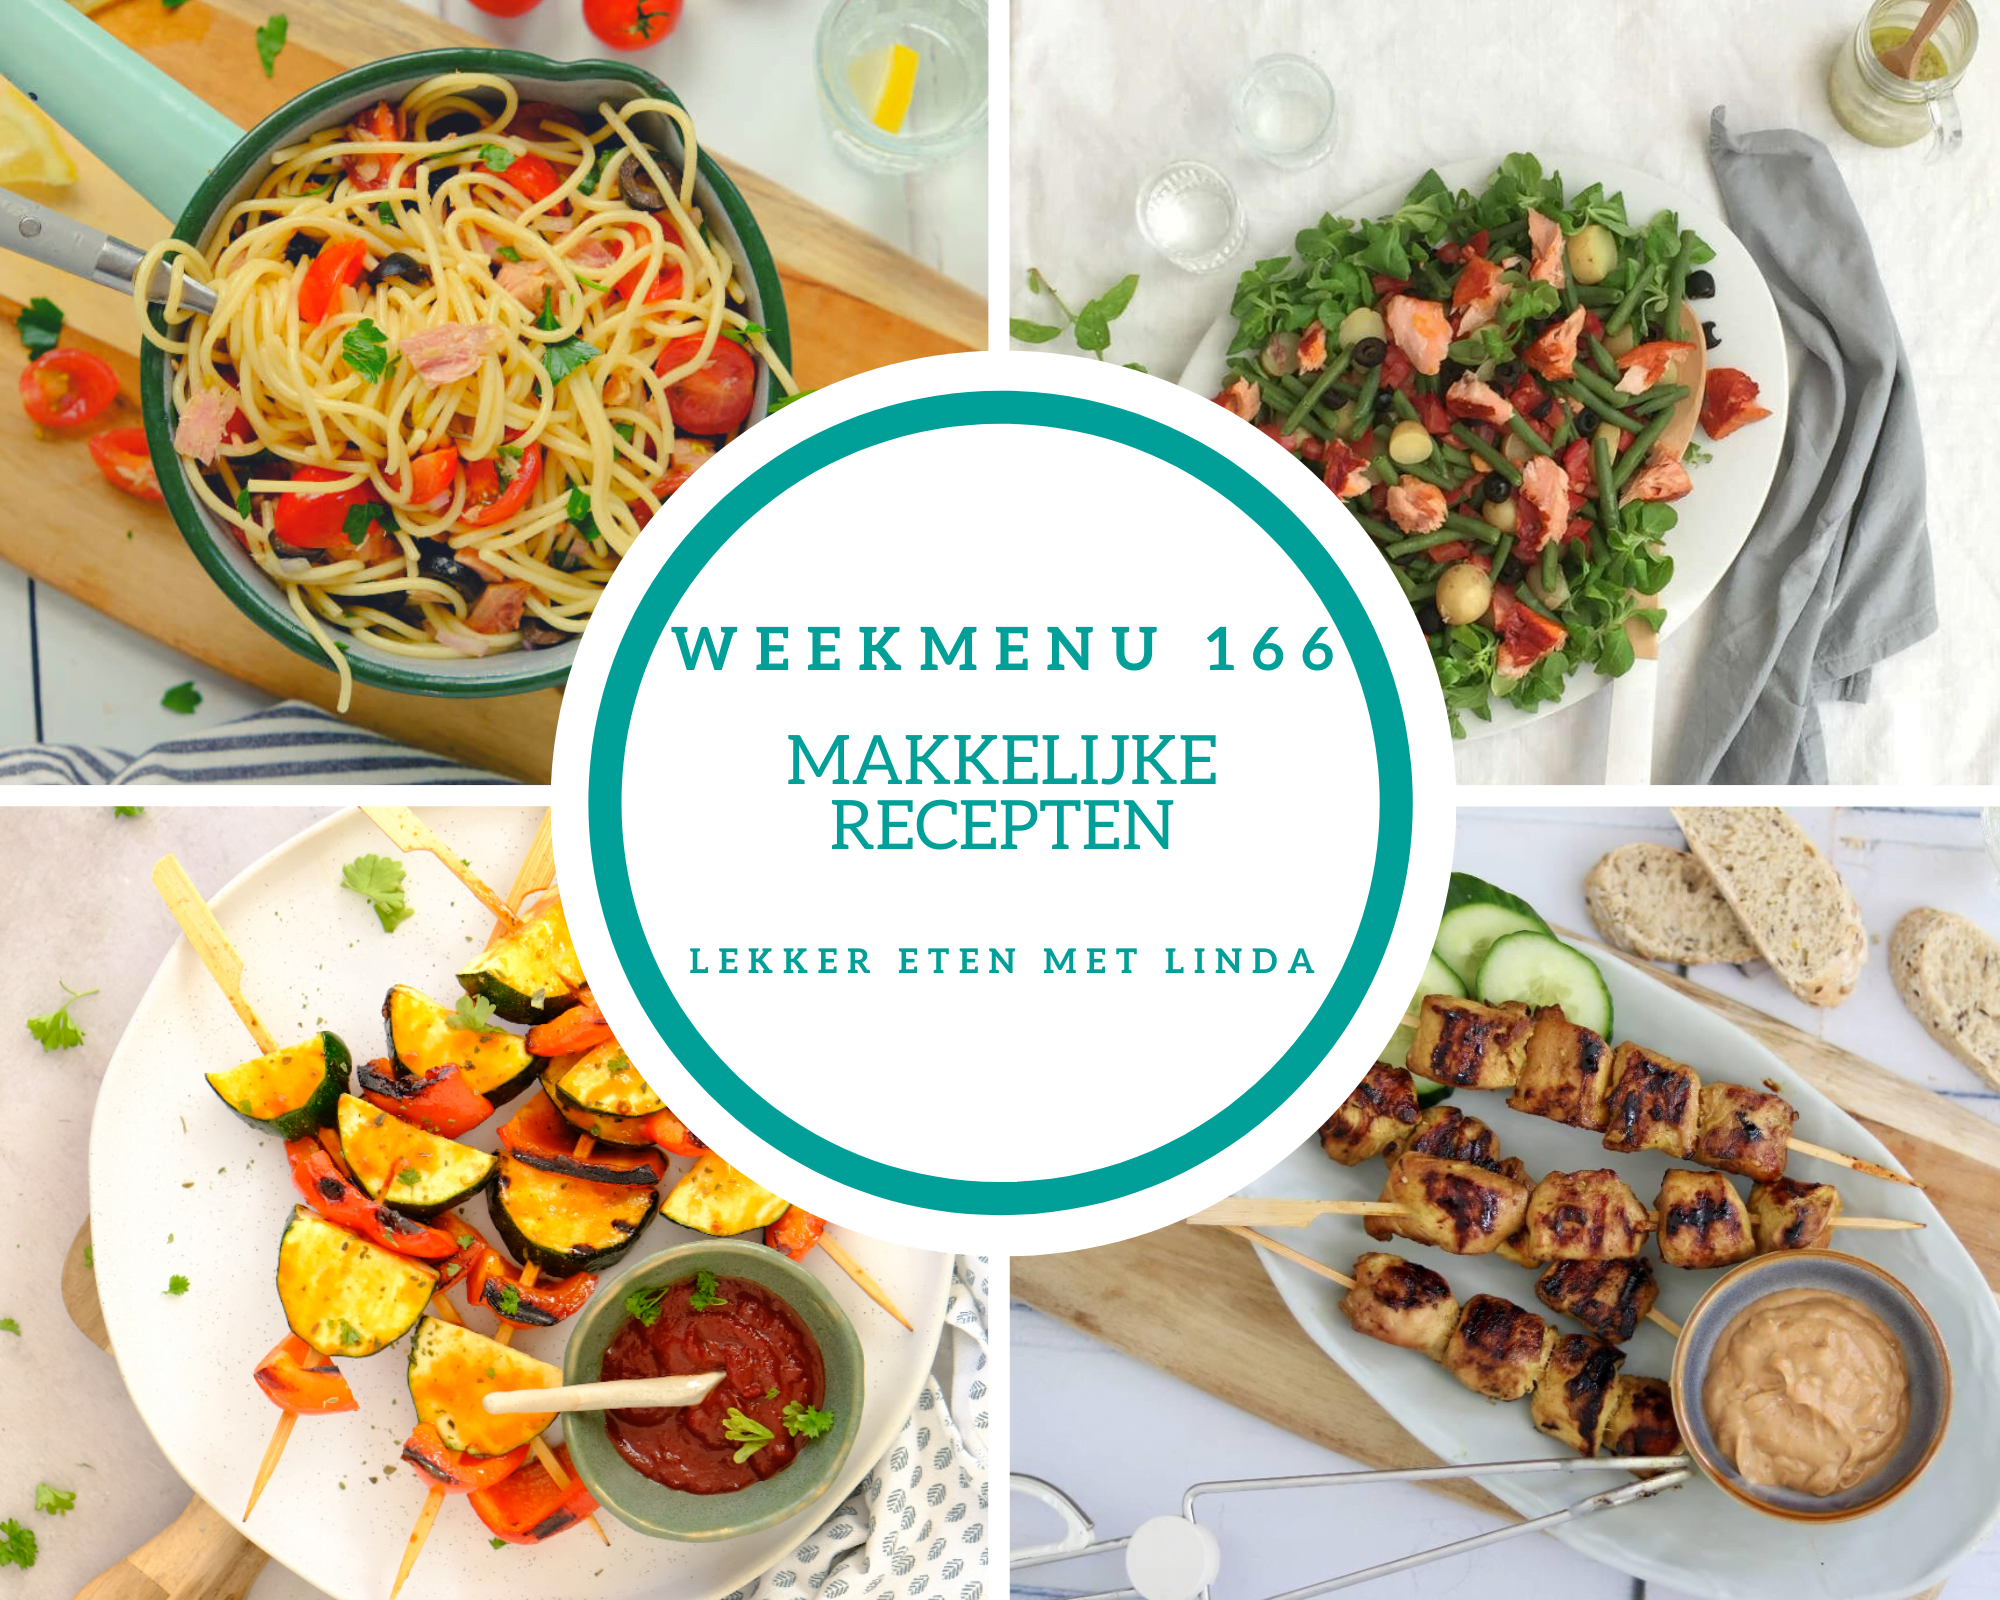 Weekmenu 166 makkelijke recepten